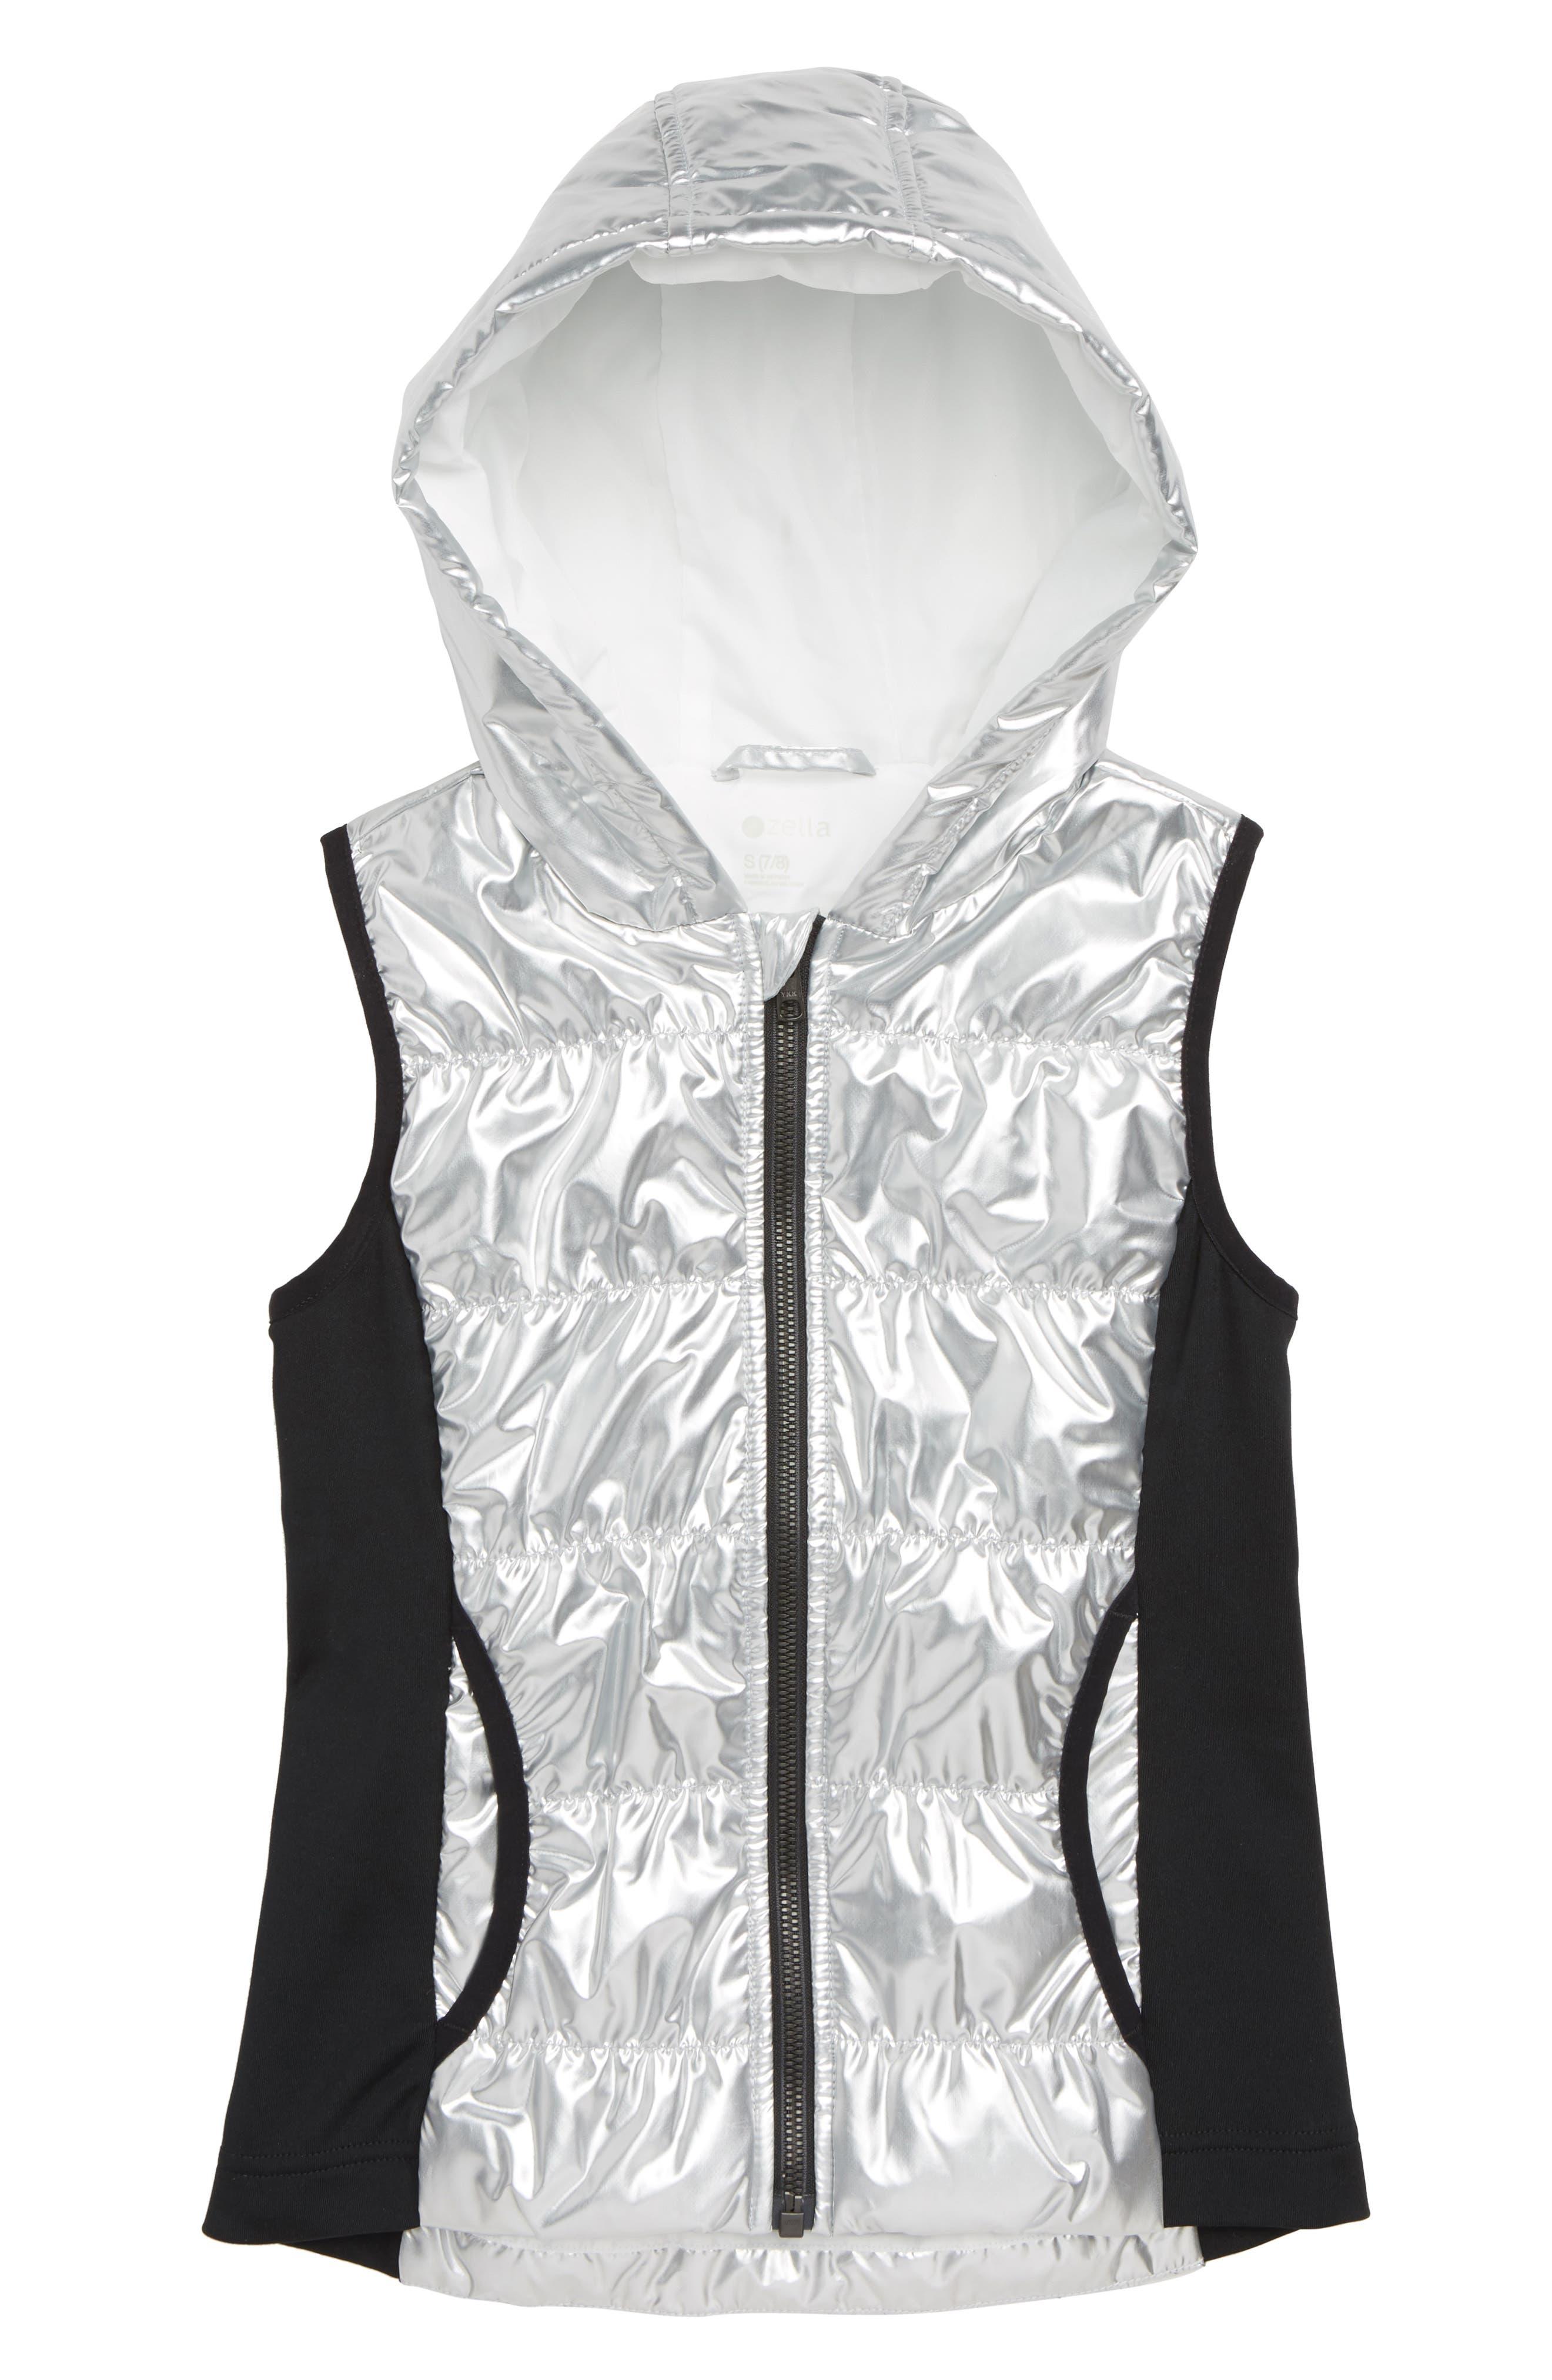 ZELLA GIRL Zella Shine Quilted Hooded Vest, Main, color, METALLIC SILVER